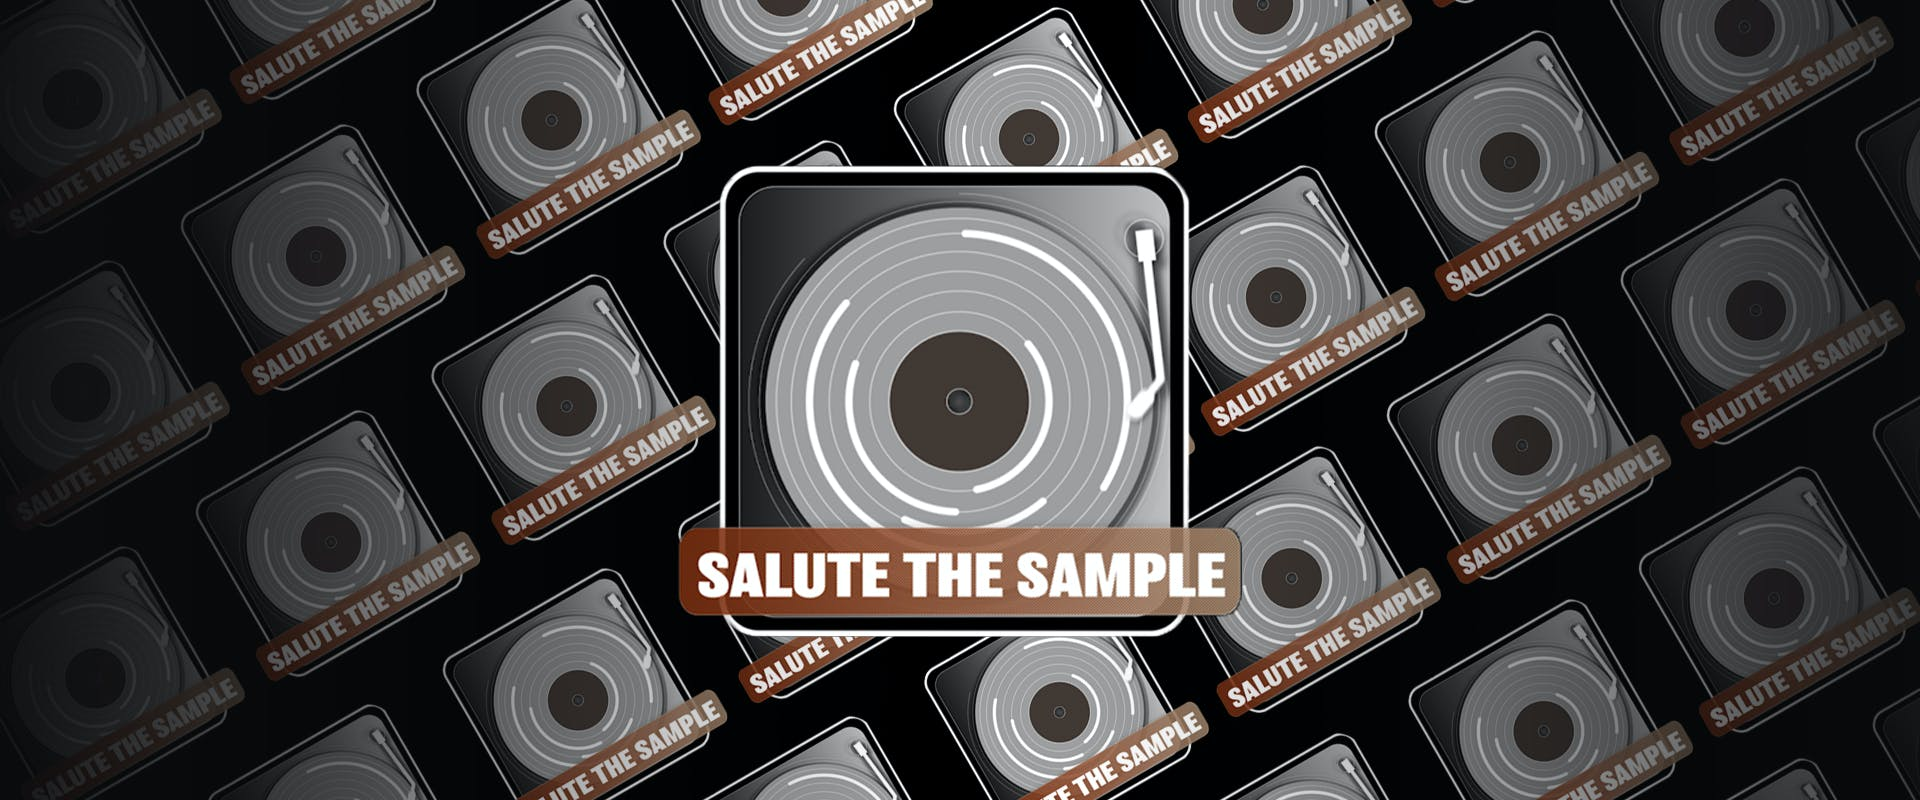 Salute The Sample